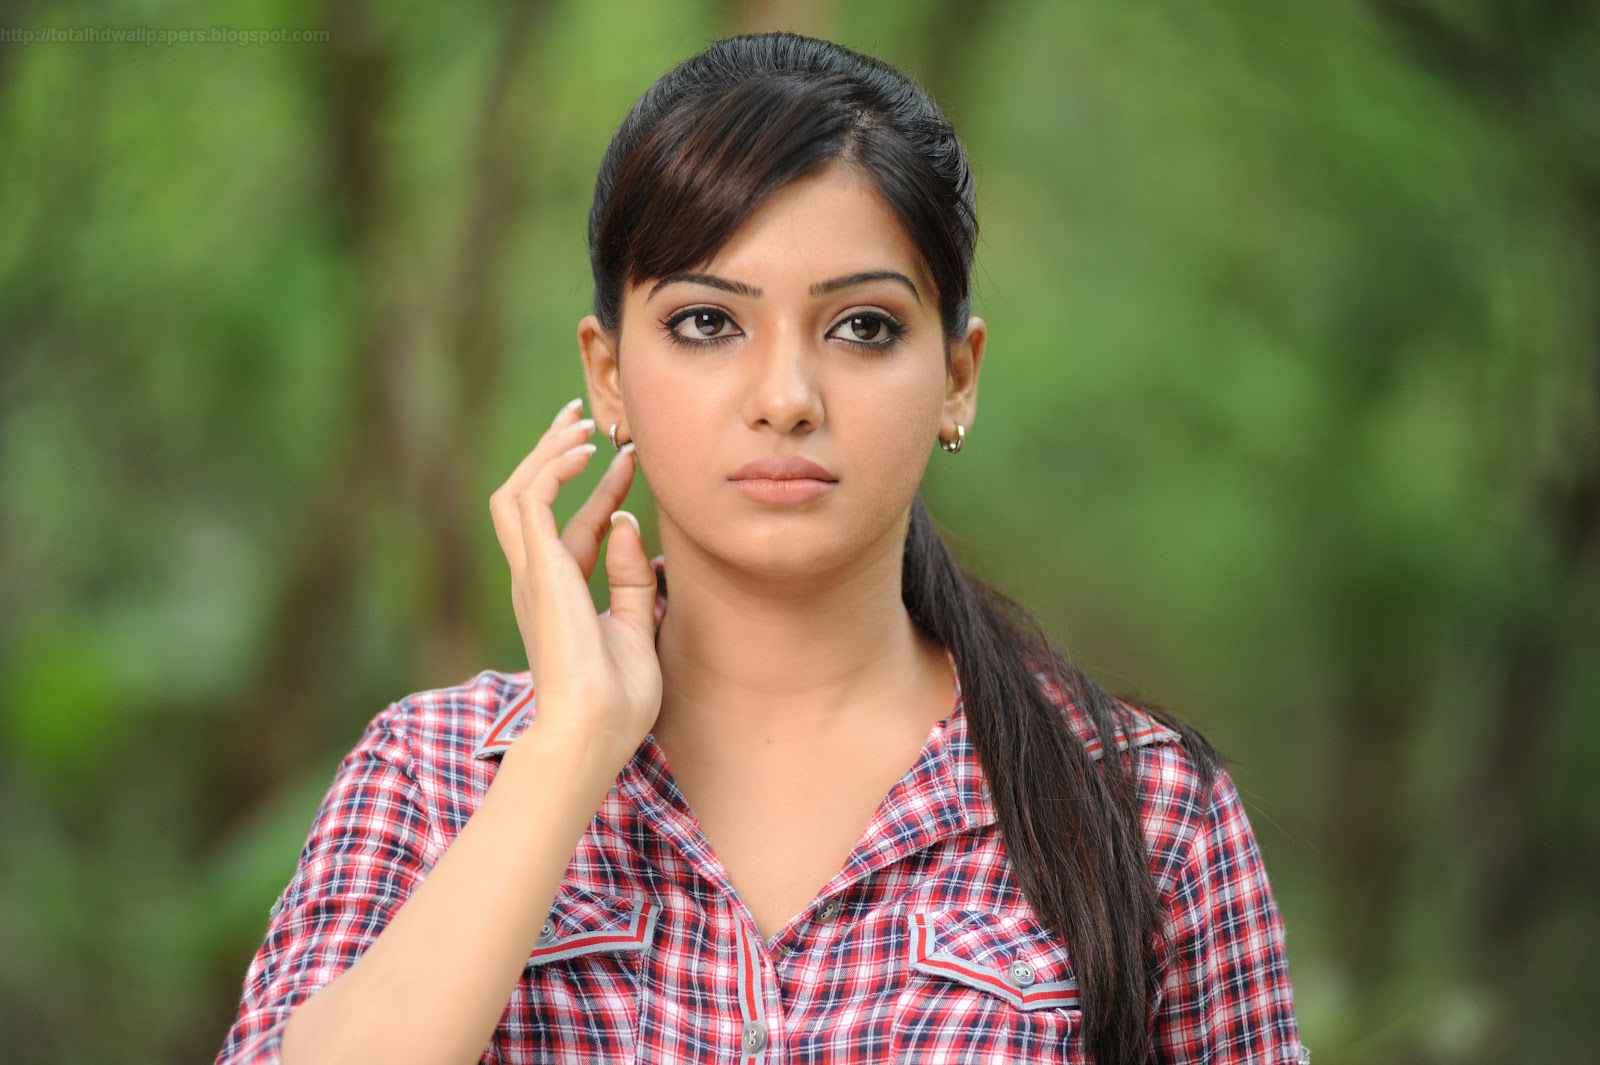 actress hd wallpapers south indian actress hd wallpapers bollywood